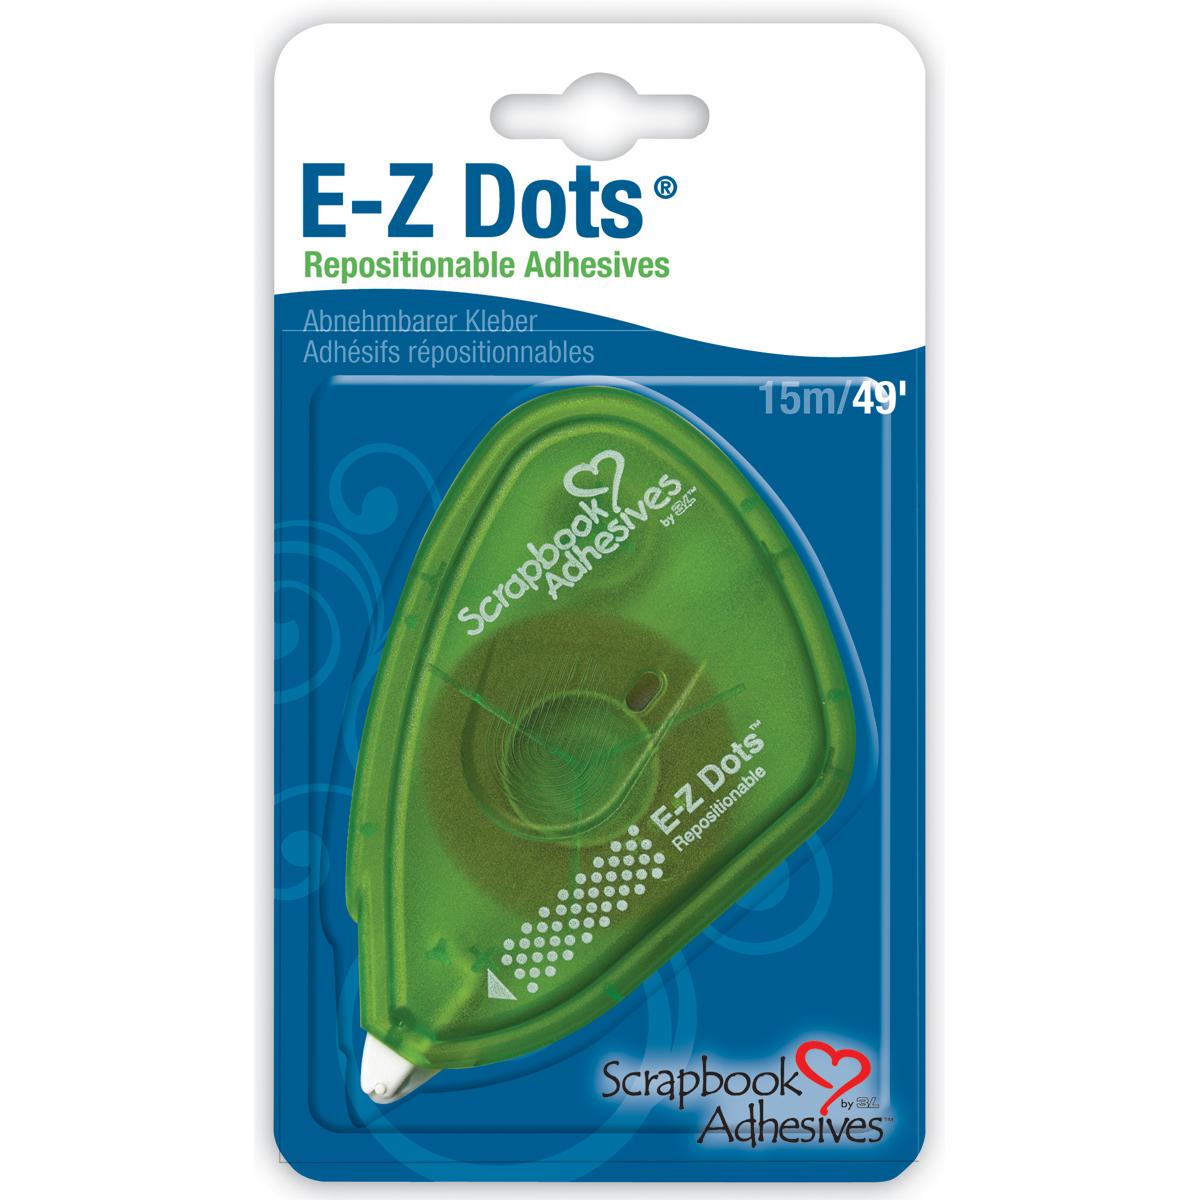 Scrapbook Adhesives E-Z Dots Dispenser-Repositionable, .375X49'